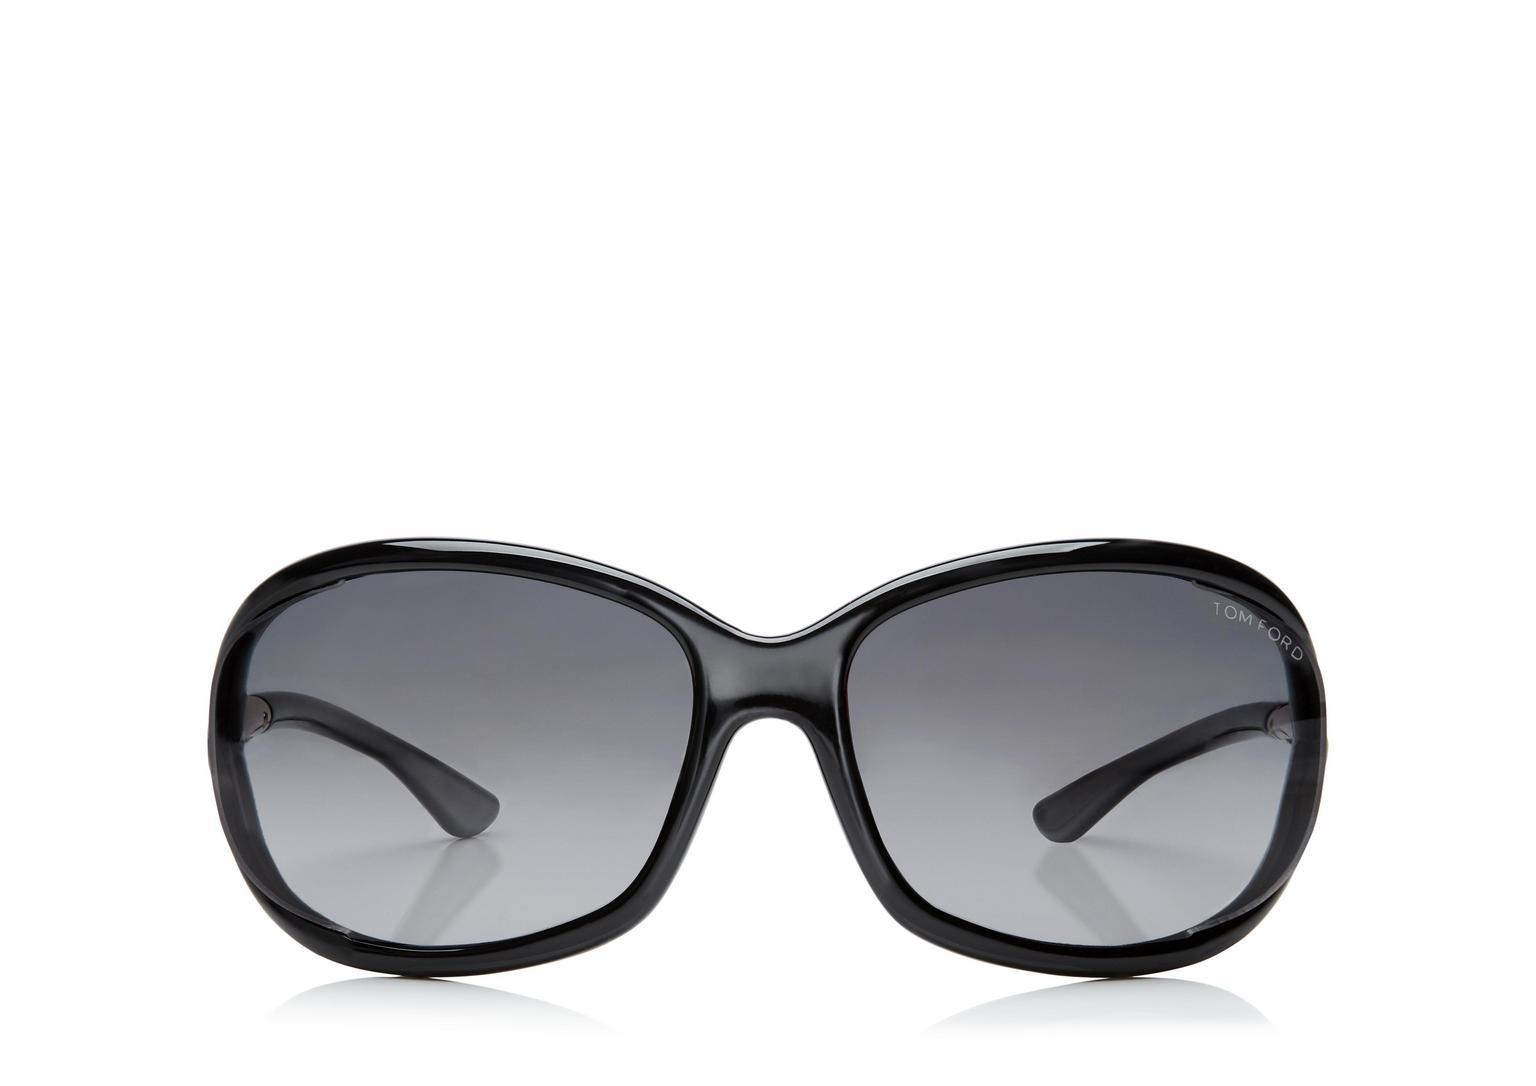 a59d9f3c667 Tom Ford Sunglasses Jennifer Polarized Discount